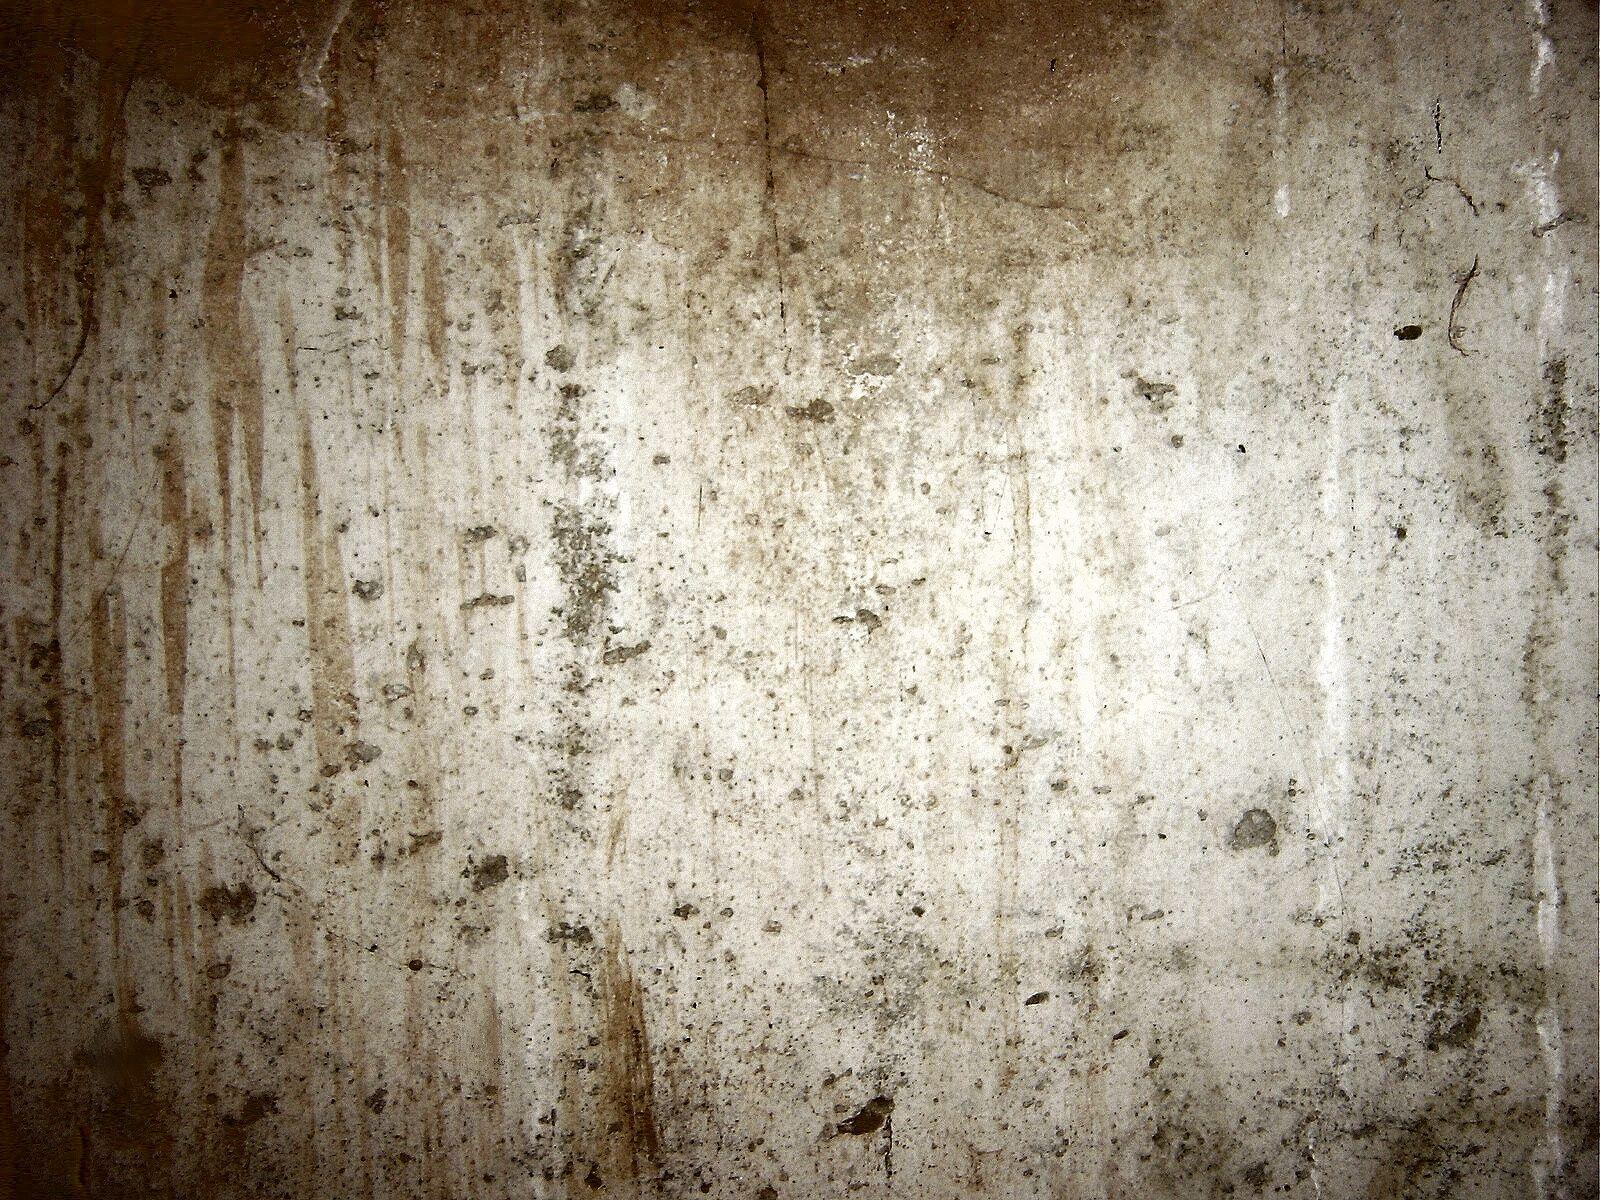 Concrete Basement Wall Texture by FantasyStock.deviantart